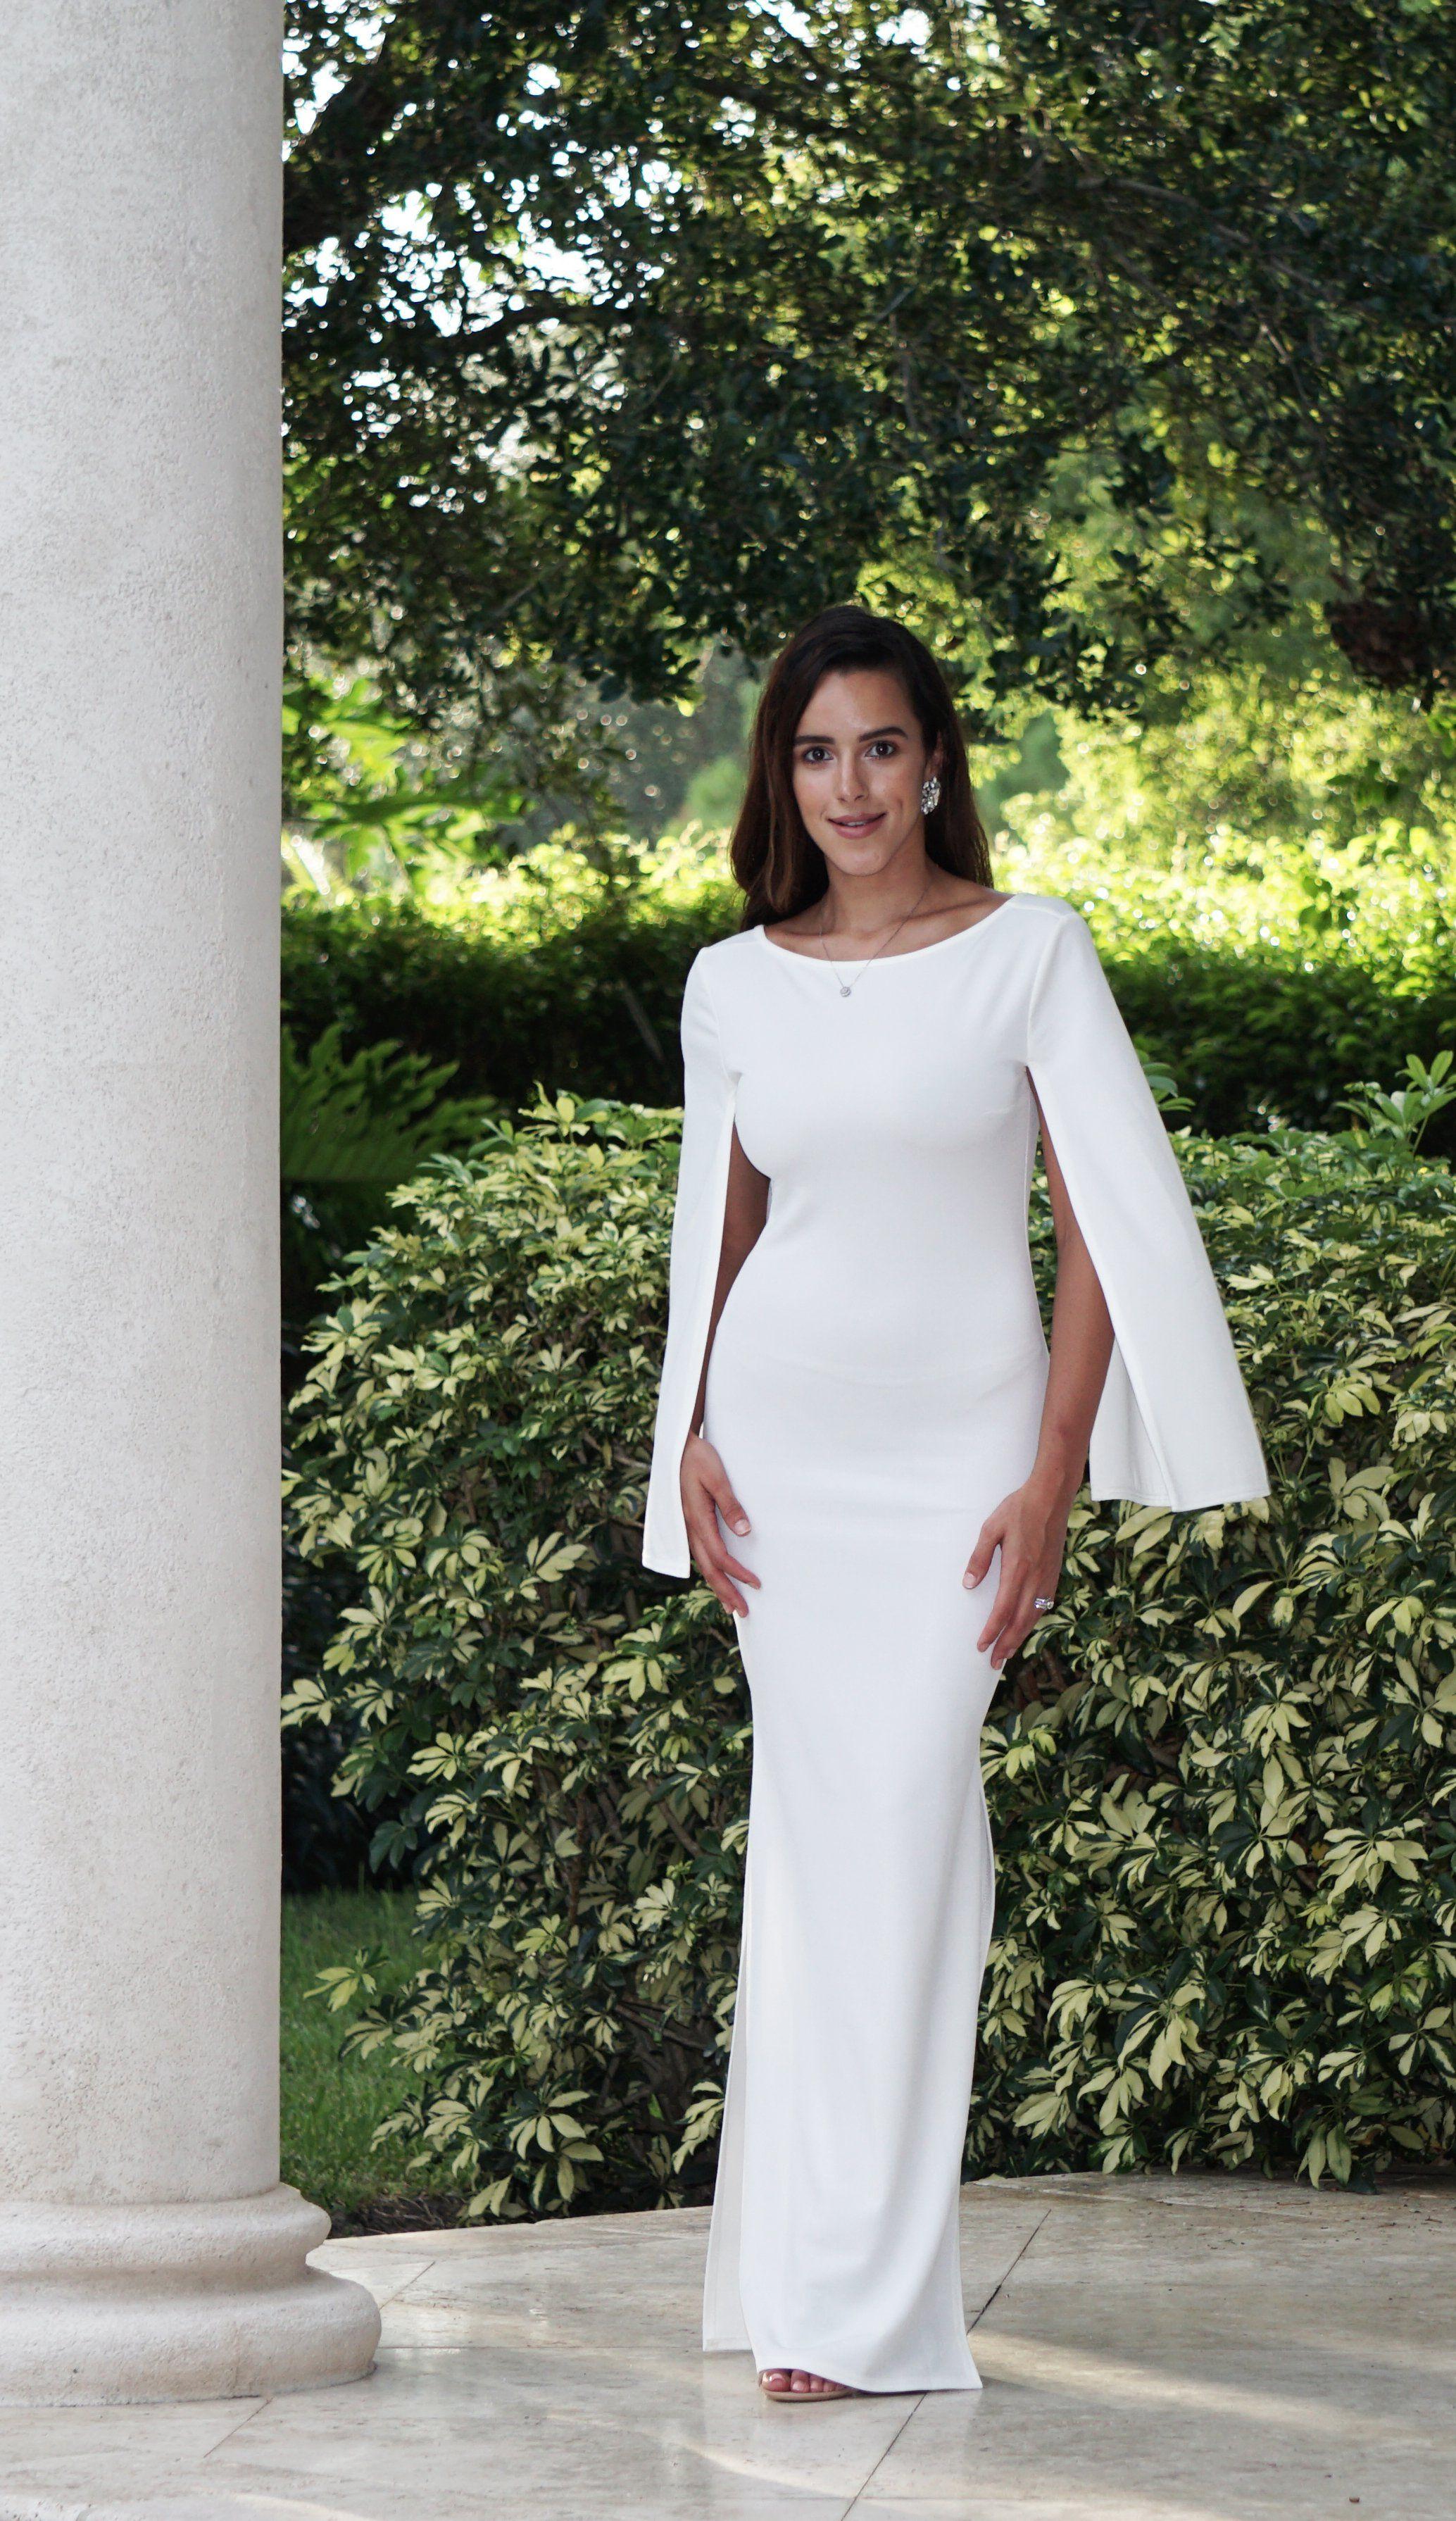 Elegant cape maxi dress ootd clothing jnamor fashion